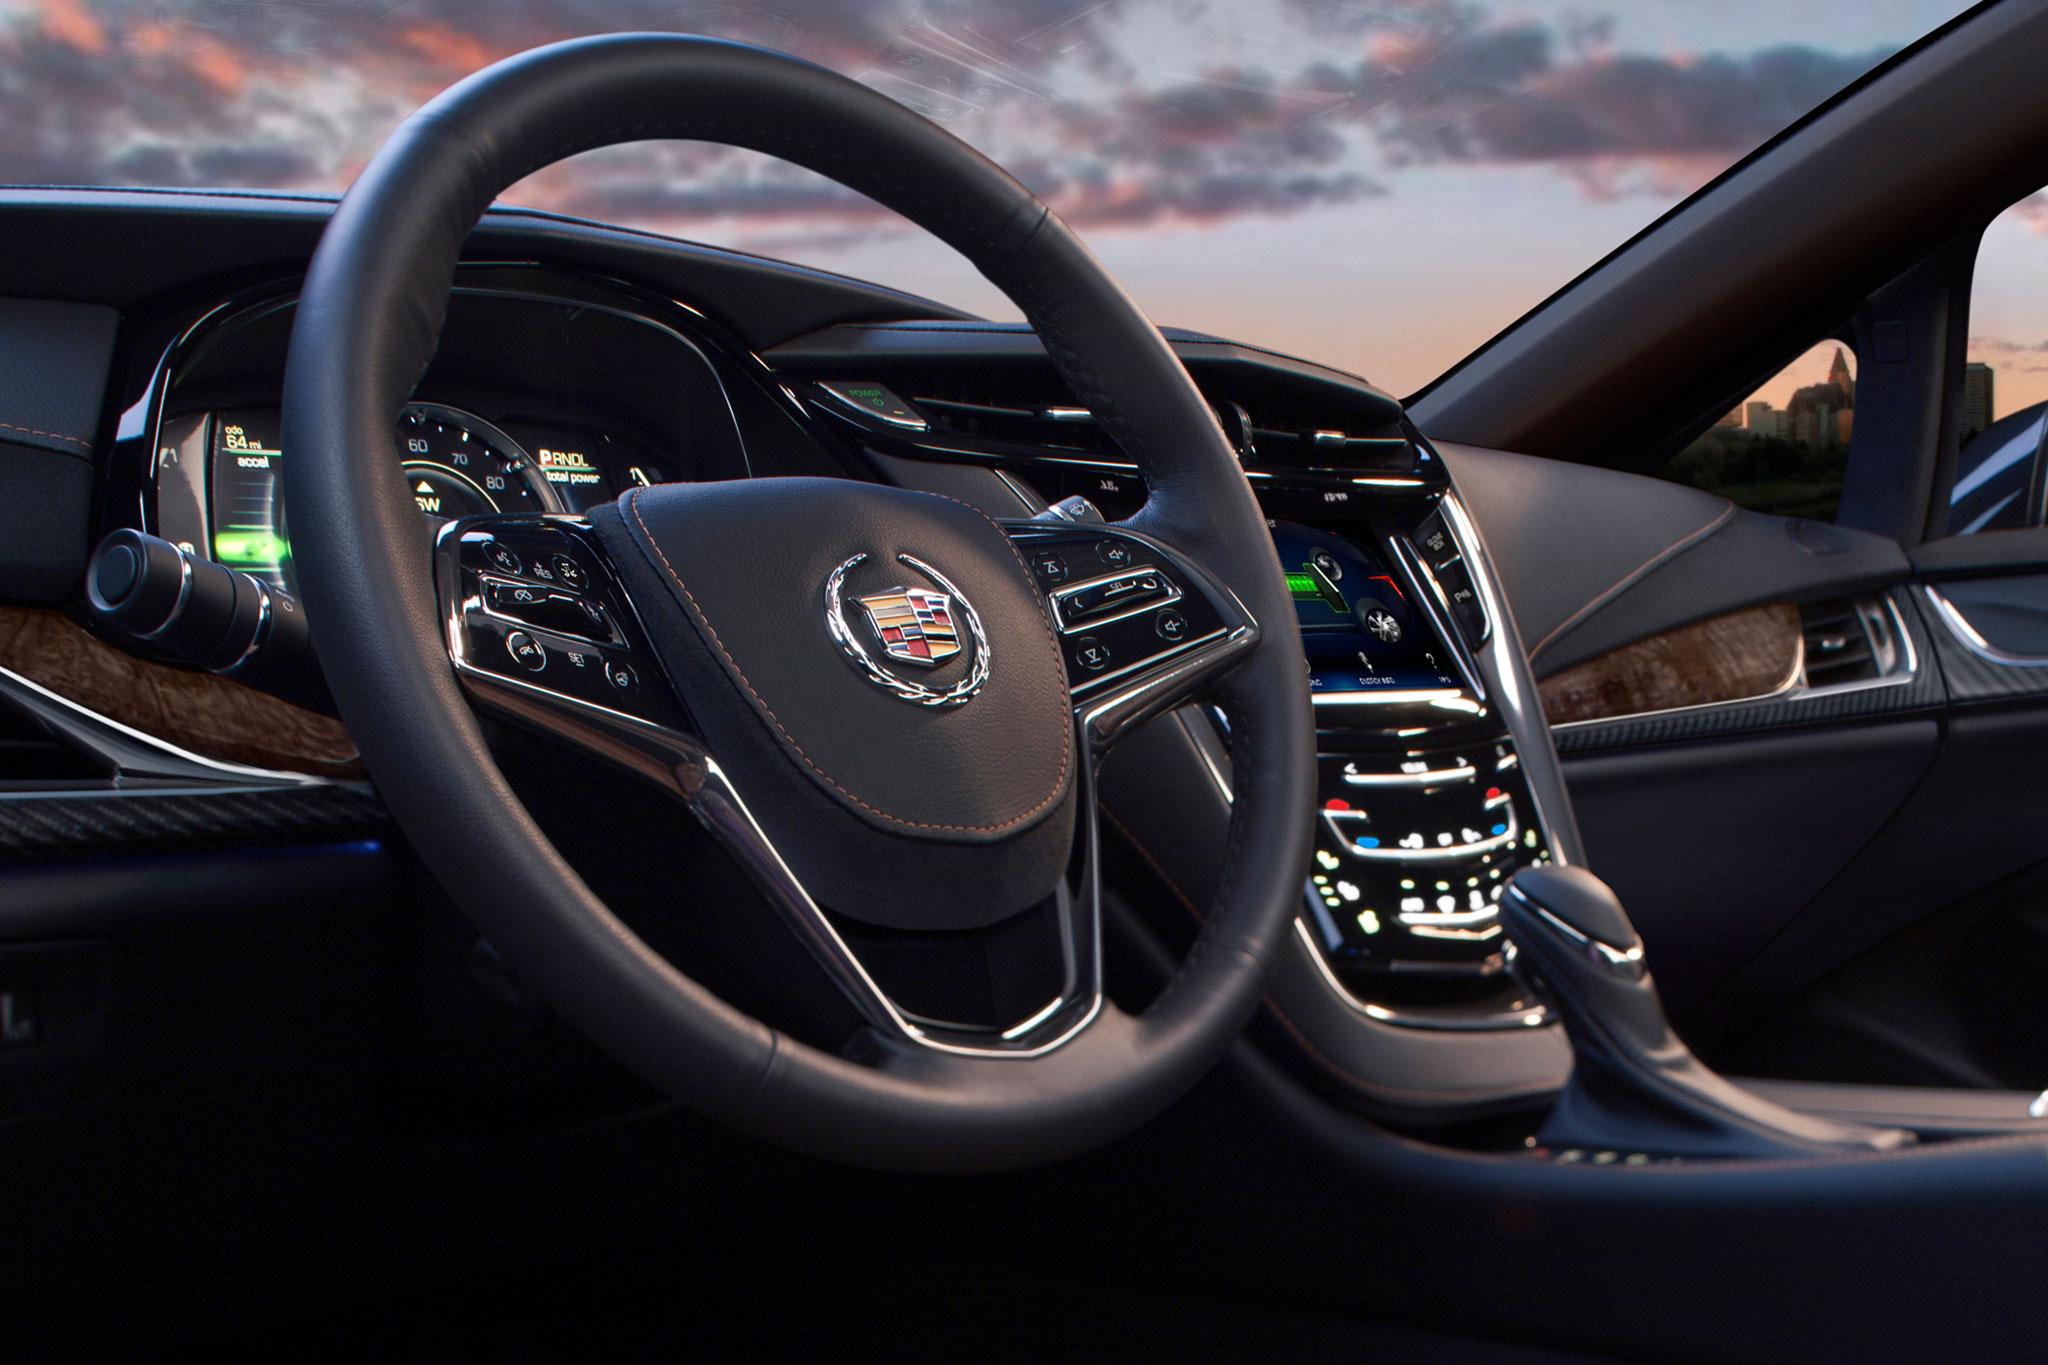 2014 Cadillac ELR VIN Check, Specs & Recalls - AutoDetective